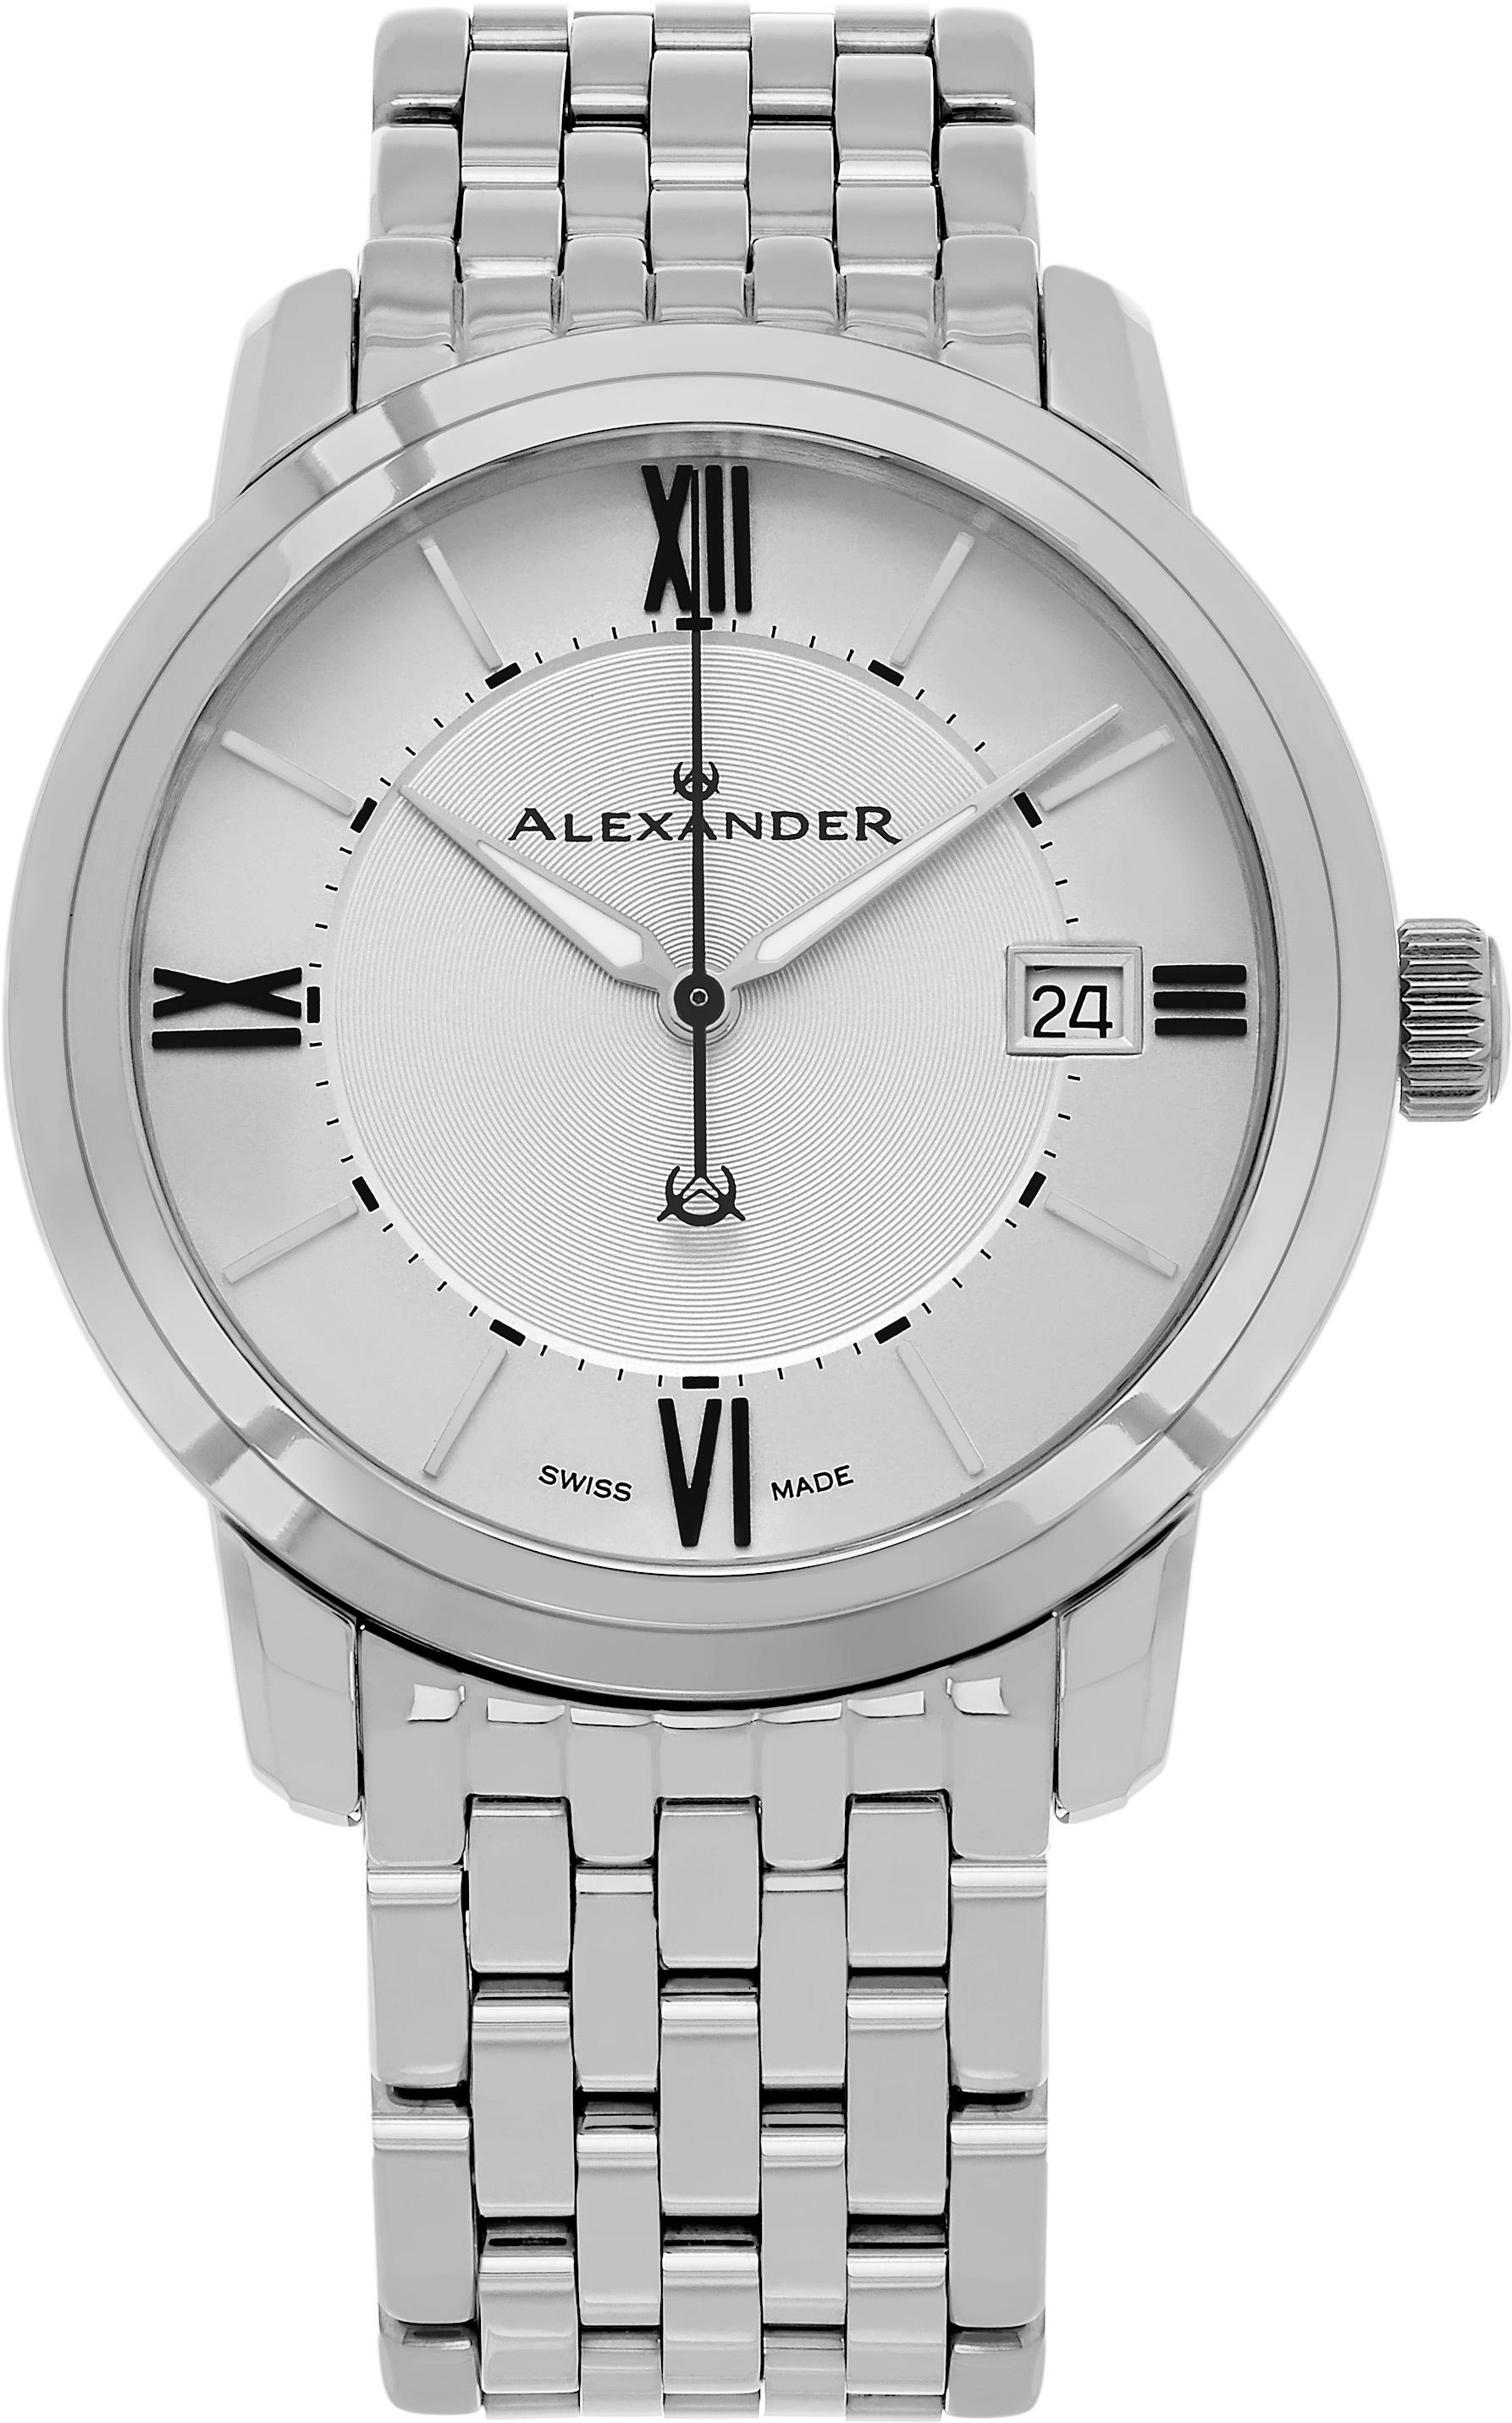 Alexander Heroic Herrklocka A111B-04 Silverfärgad/Stål Ø40 mm - Alexander